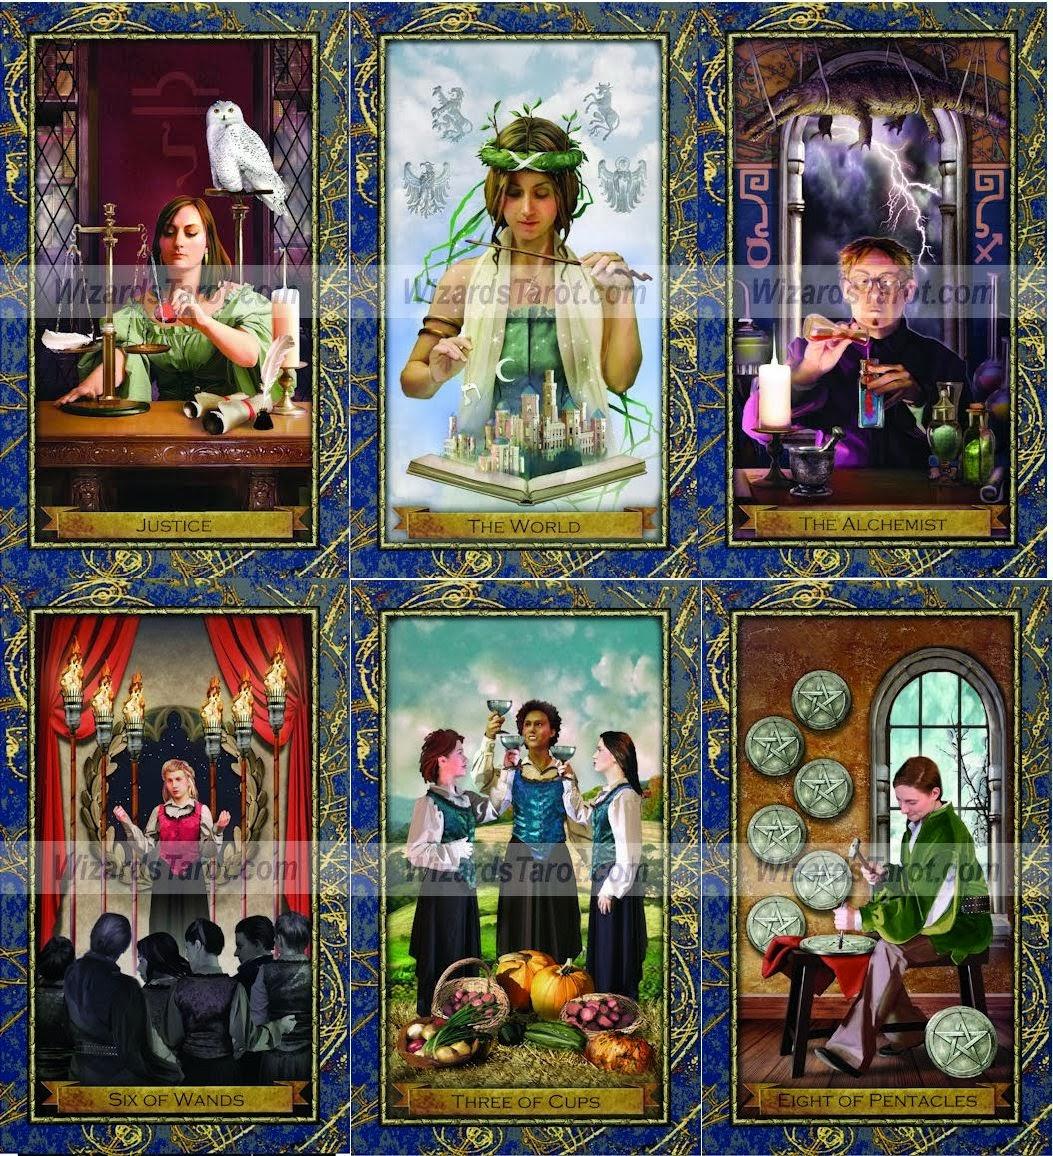 Harry Potter Wizards Tarot Witches Ellen Dugan 3D computer graphic ไพ่ยิปซี ไพ่ทาโร่ แฮรี่ พอตเตอร์ แฮร์รี่ ไพ่ พ่อมด